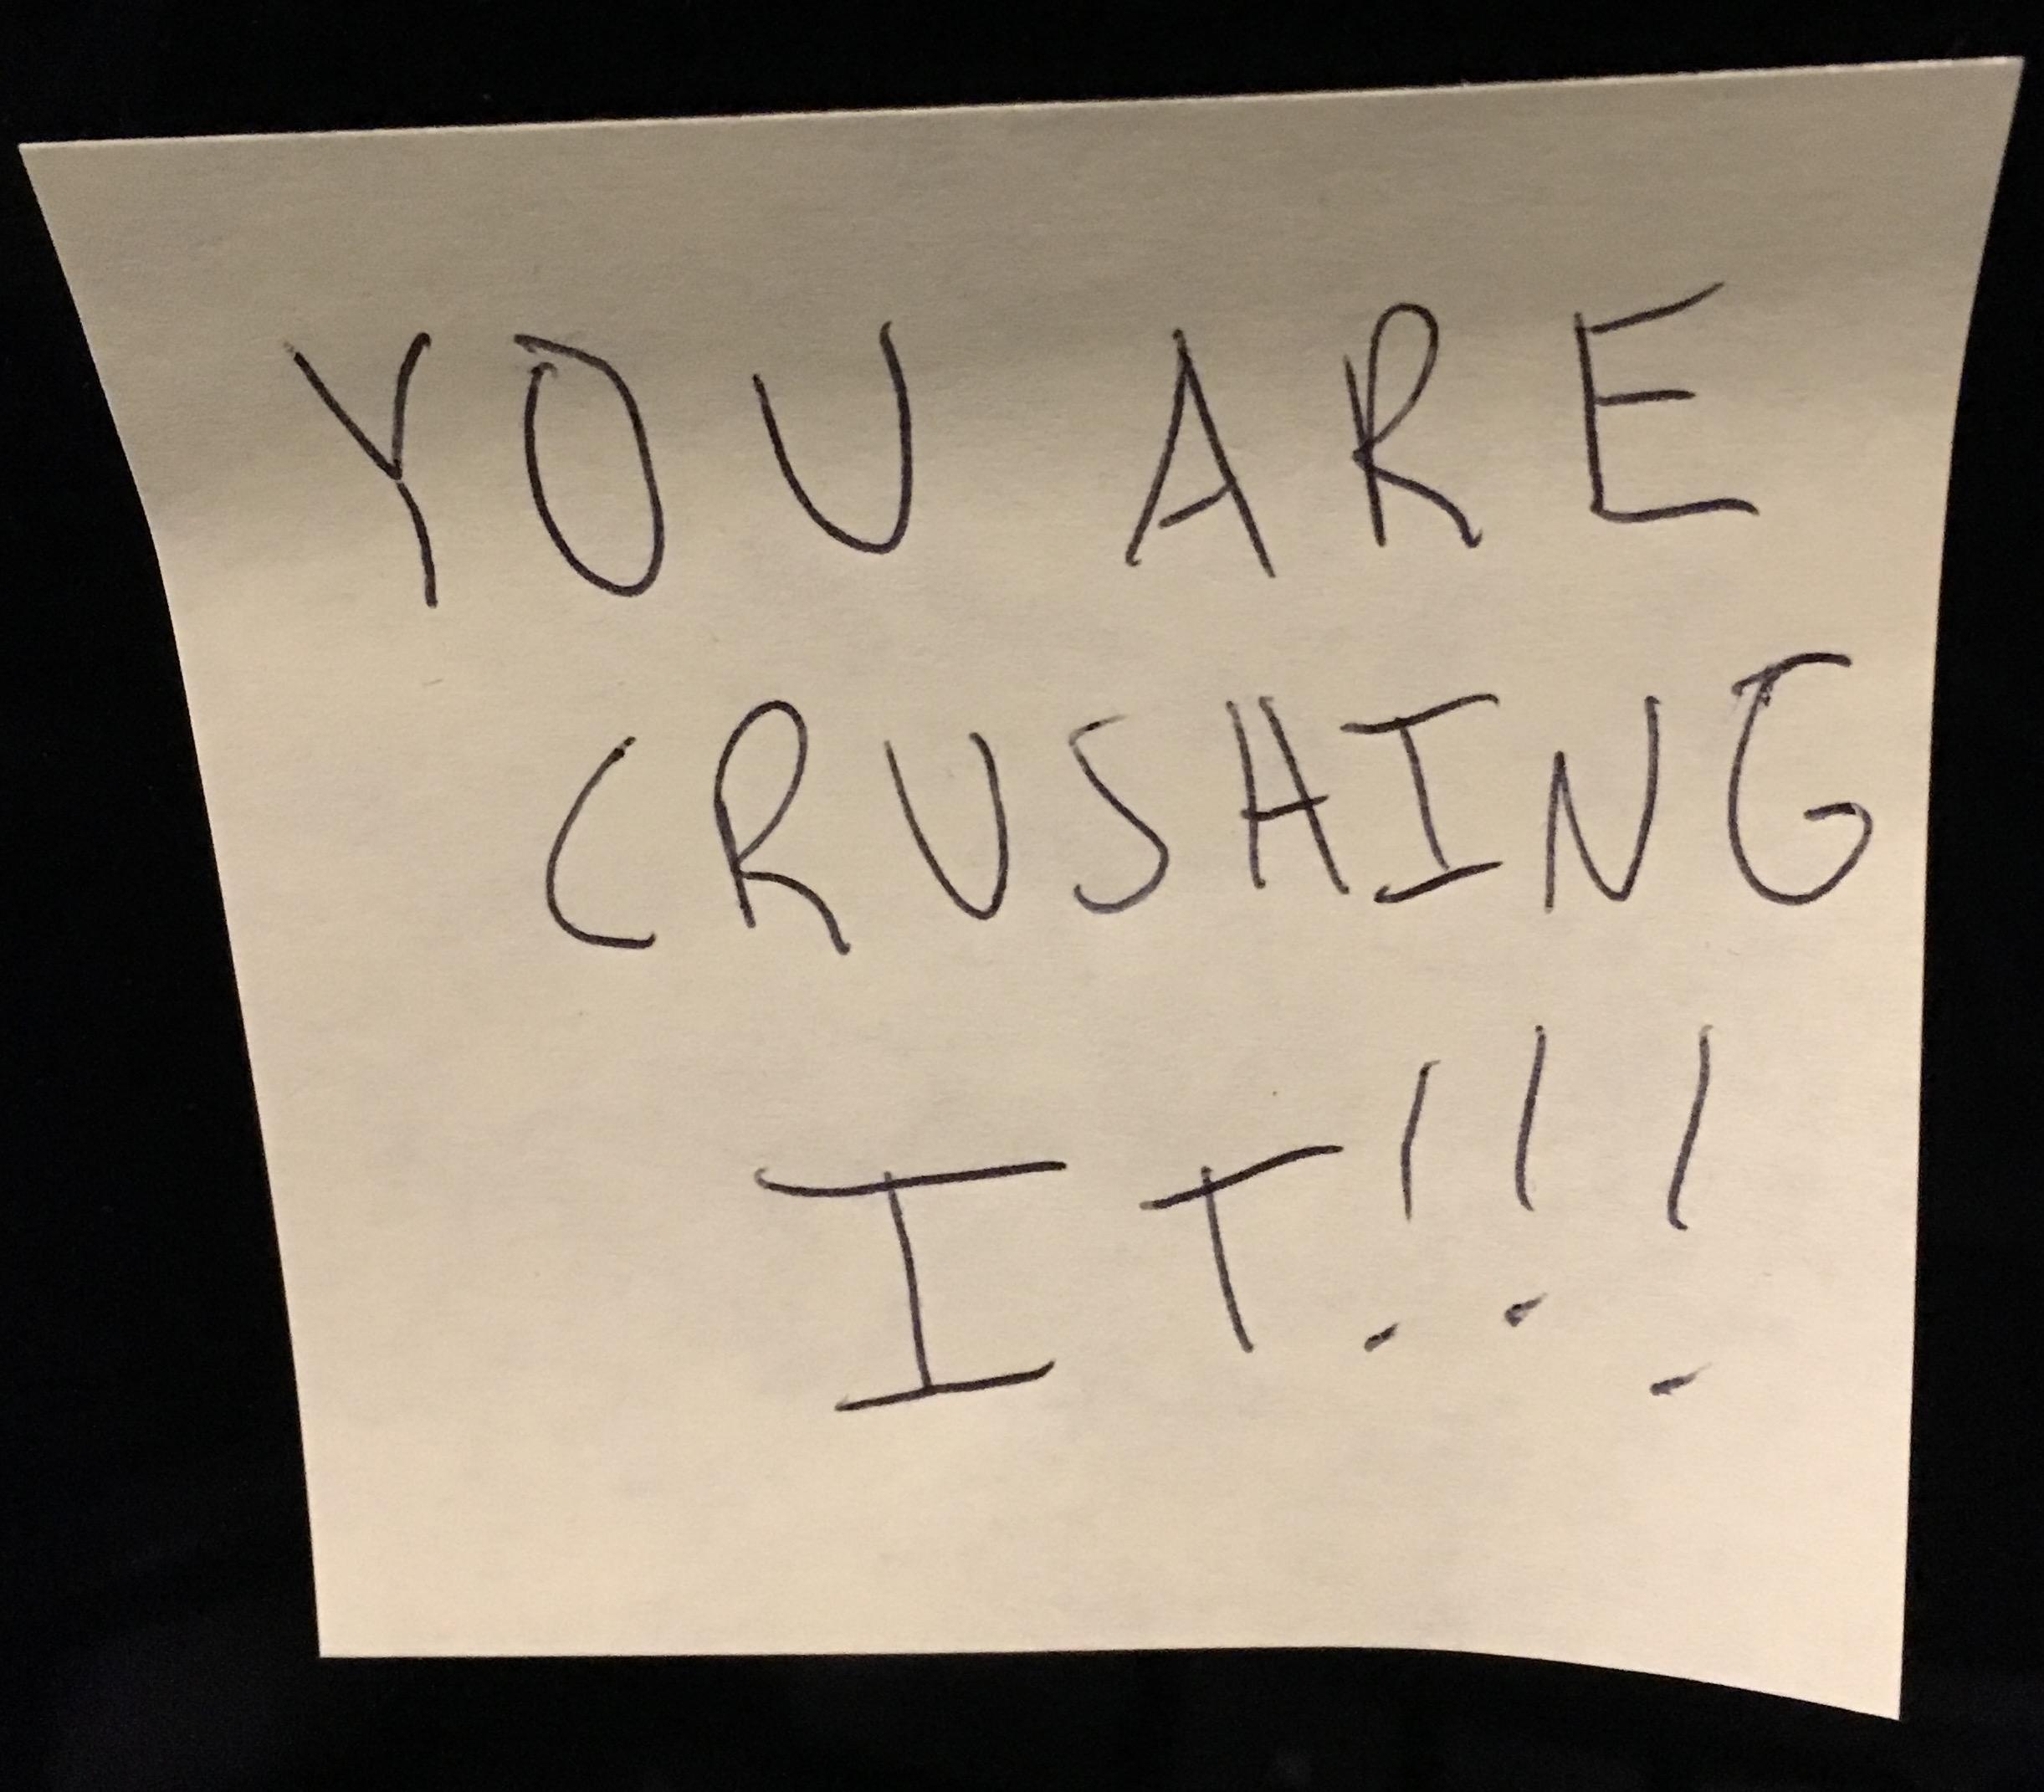 crushing-it-goal-magic.JPG